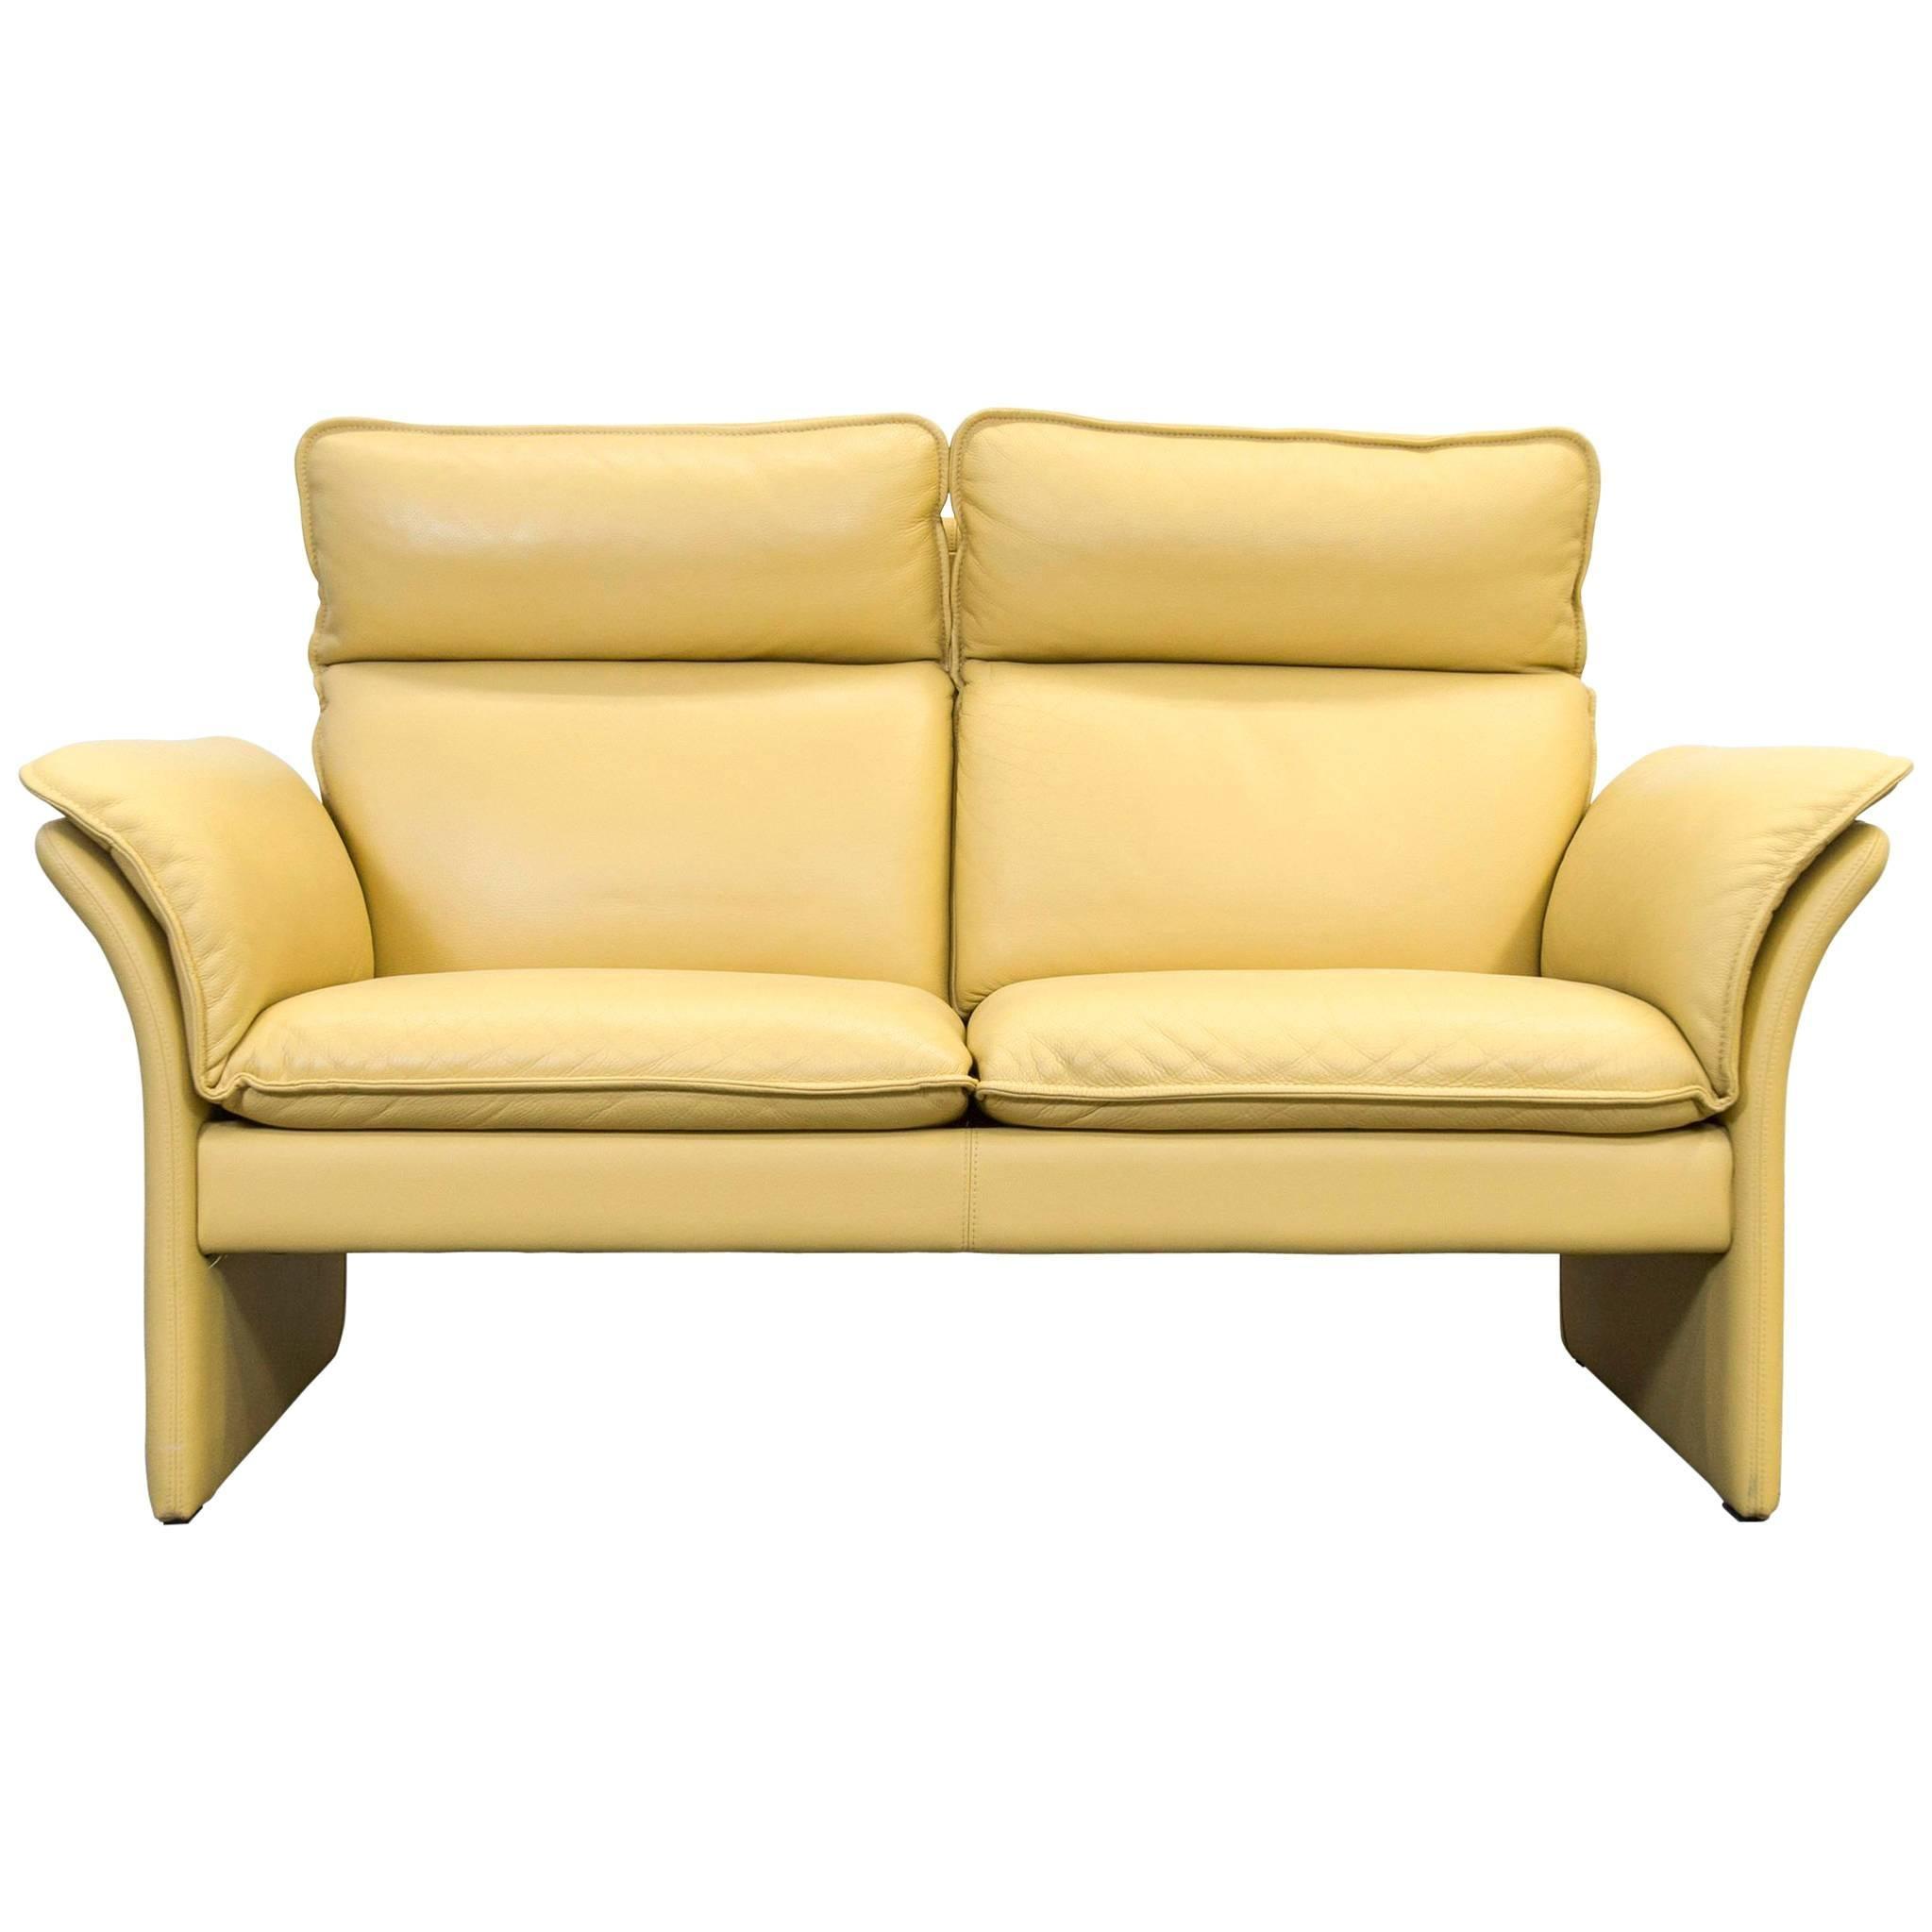 Dreipunkt Designer Leather Sofa Mustard Yellow Two Seat Couch Modern 1